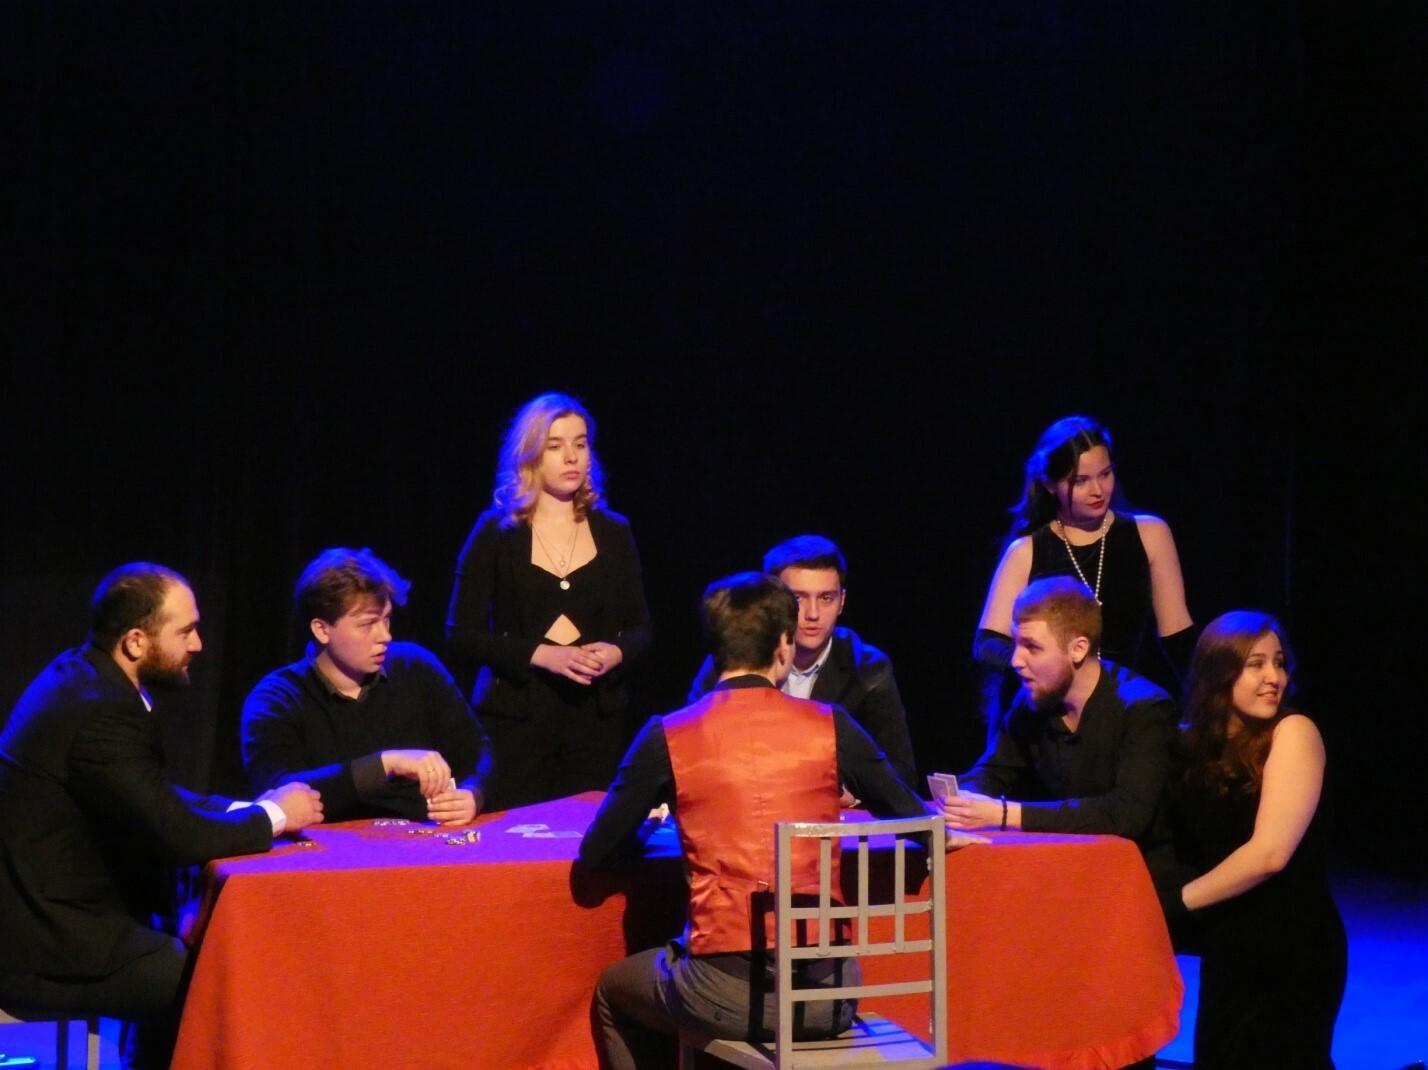 Этюд на мадригал «Lamento della Ninfa» К.Монтеверди